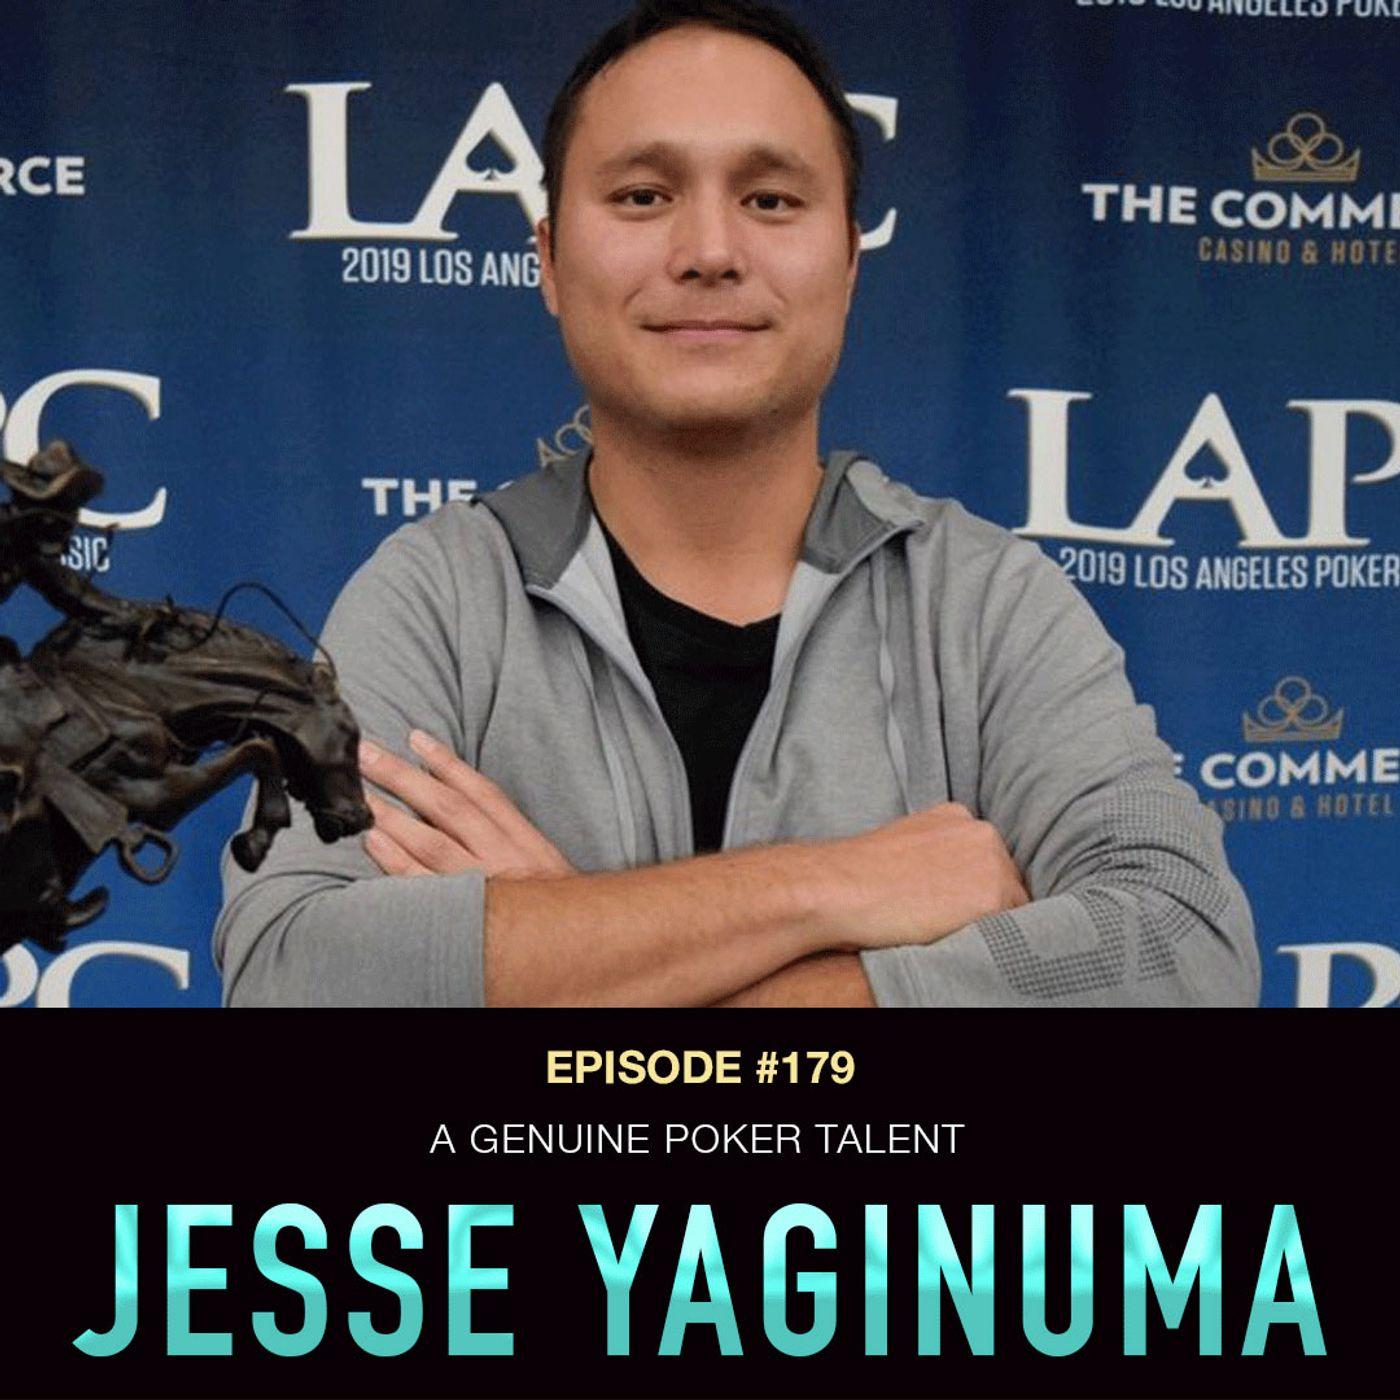 #179 Jesse Yaginuma: A Genuine Poker Talent